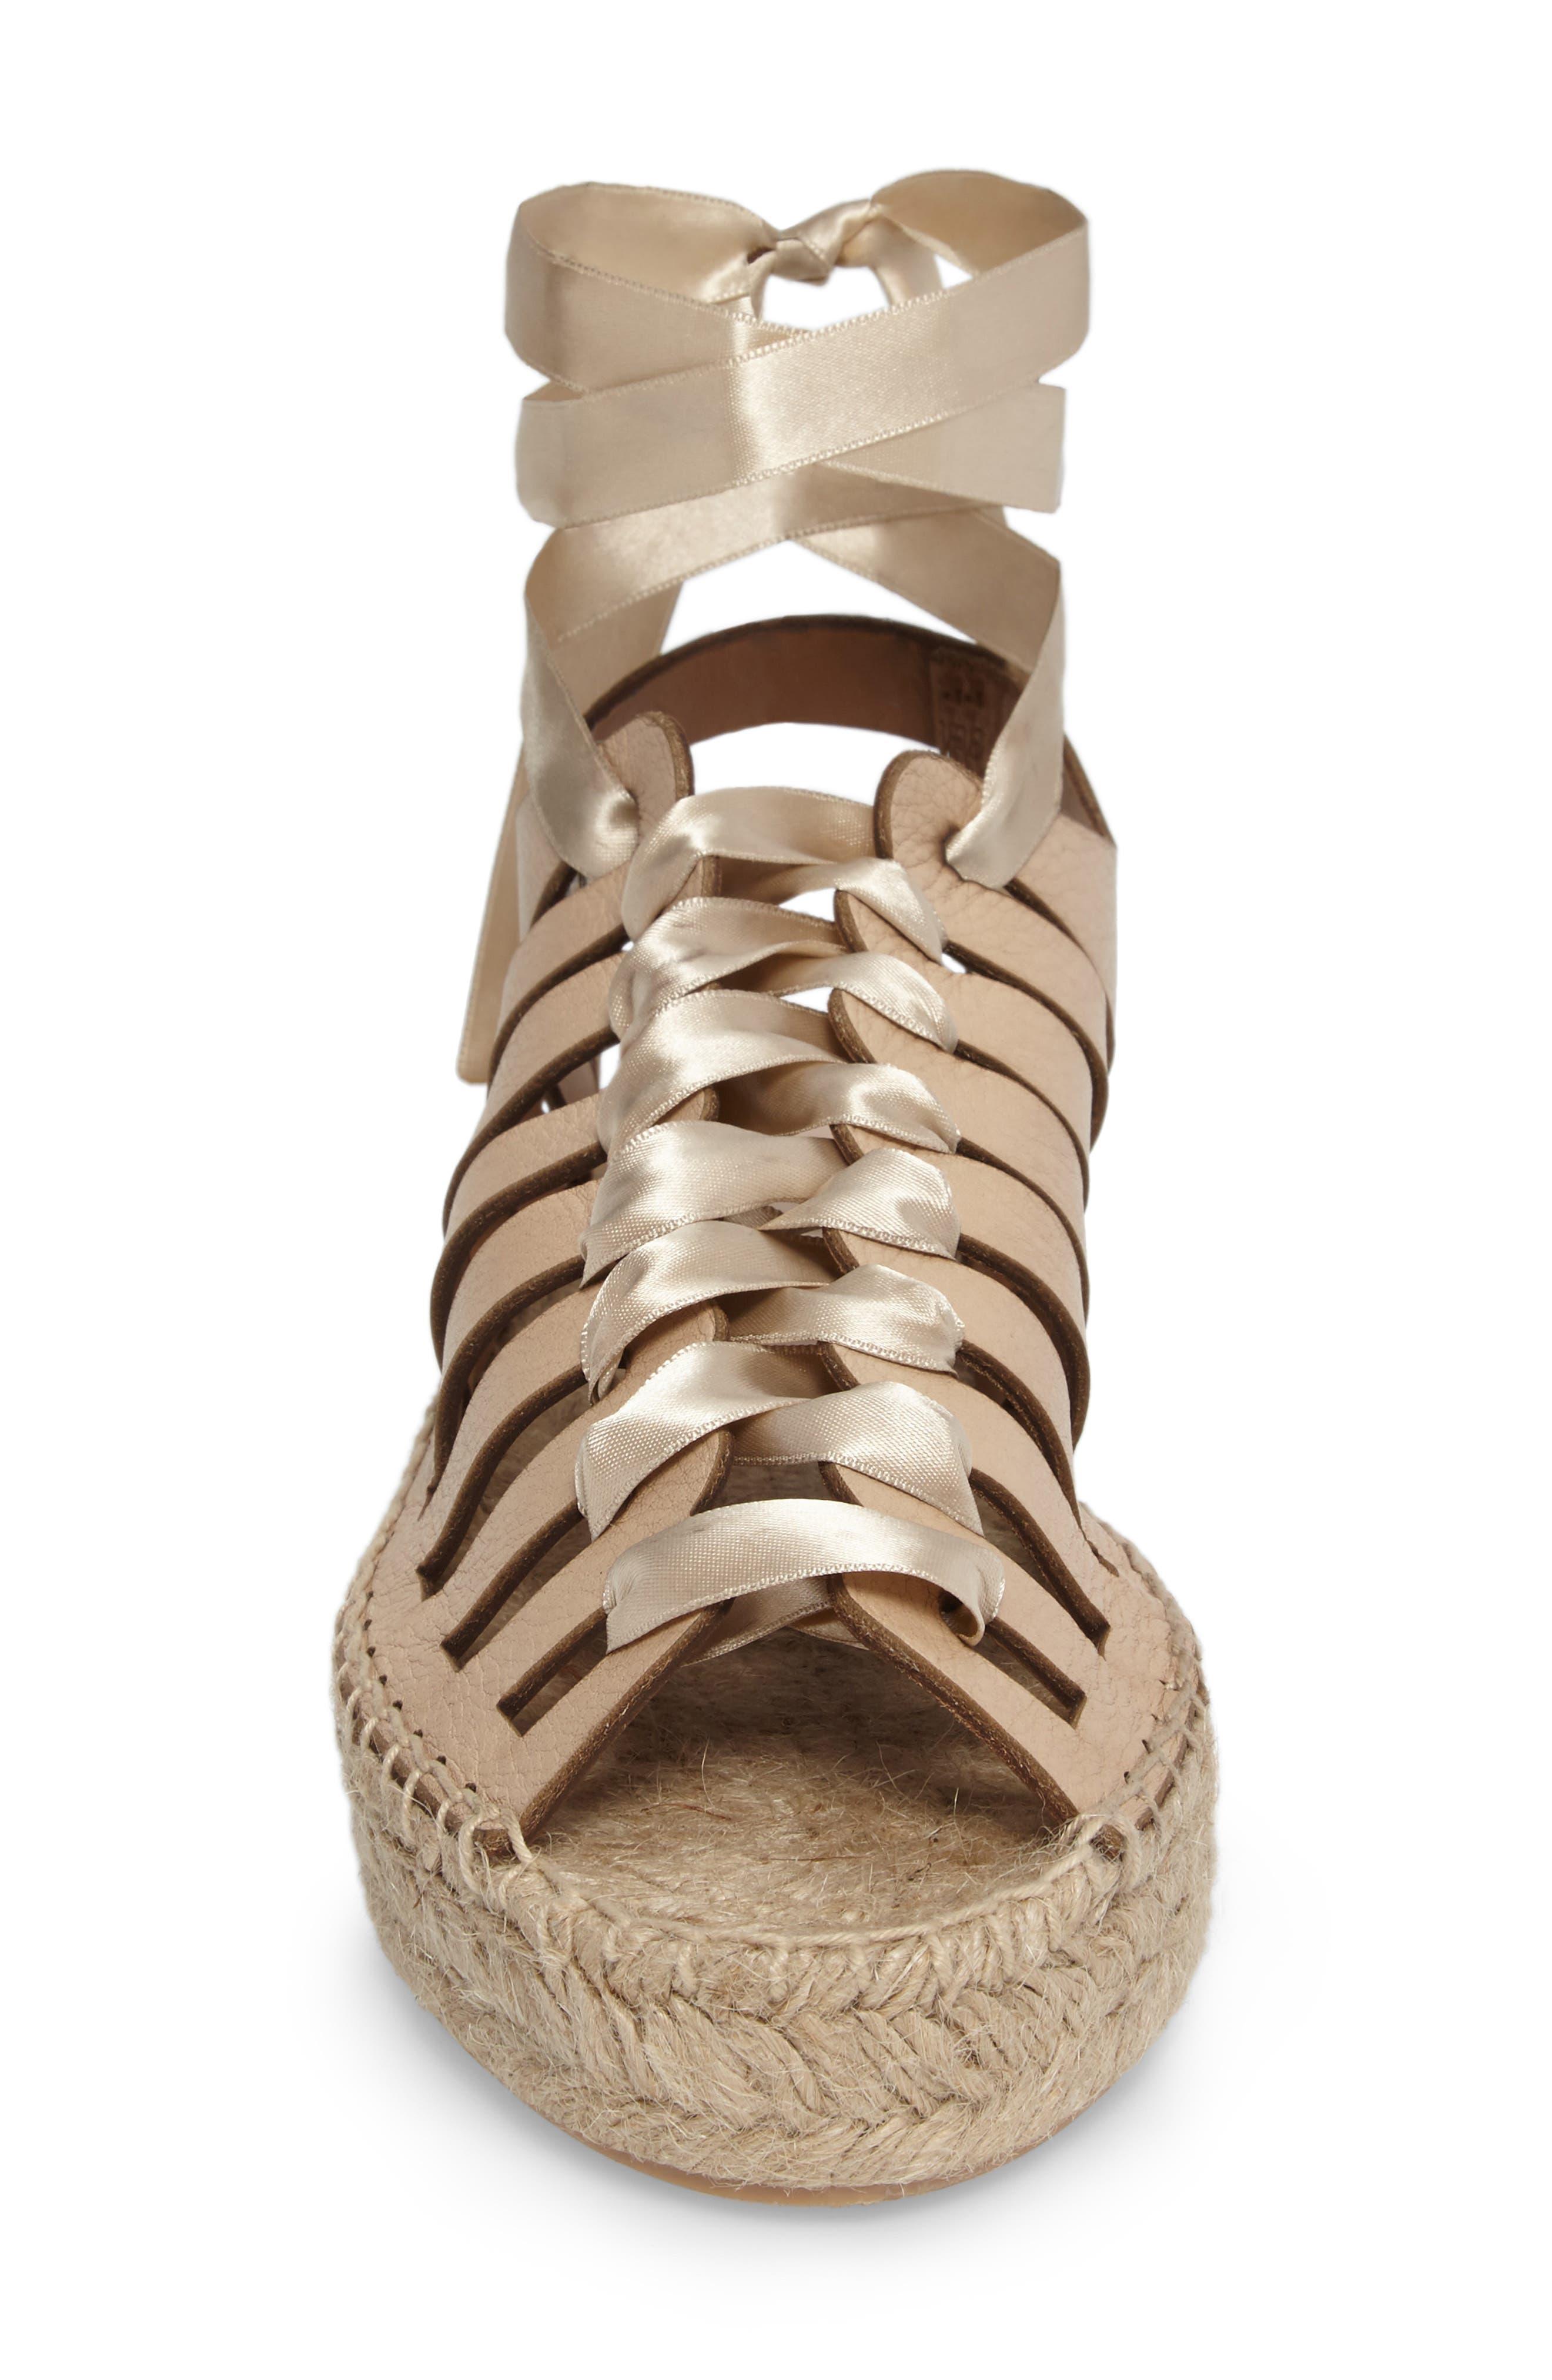 Krown Wraparound Platform Sandal,                             Alternate thumbnail 4, color,                             Nude Leather